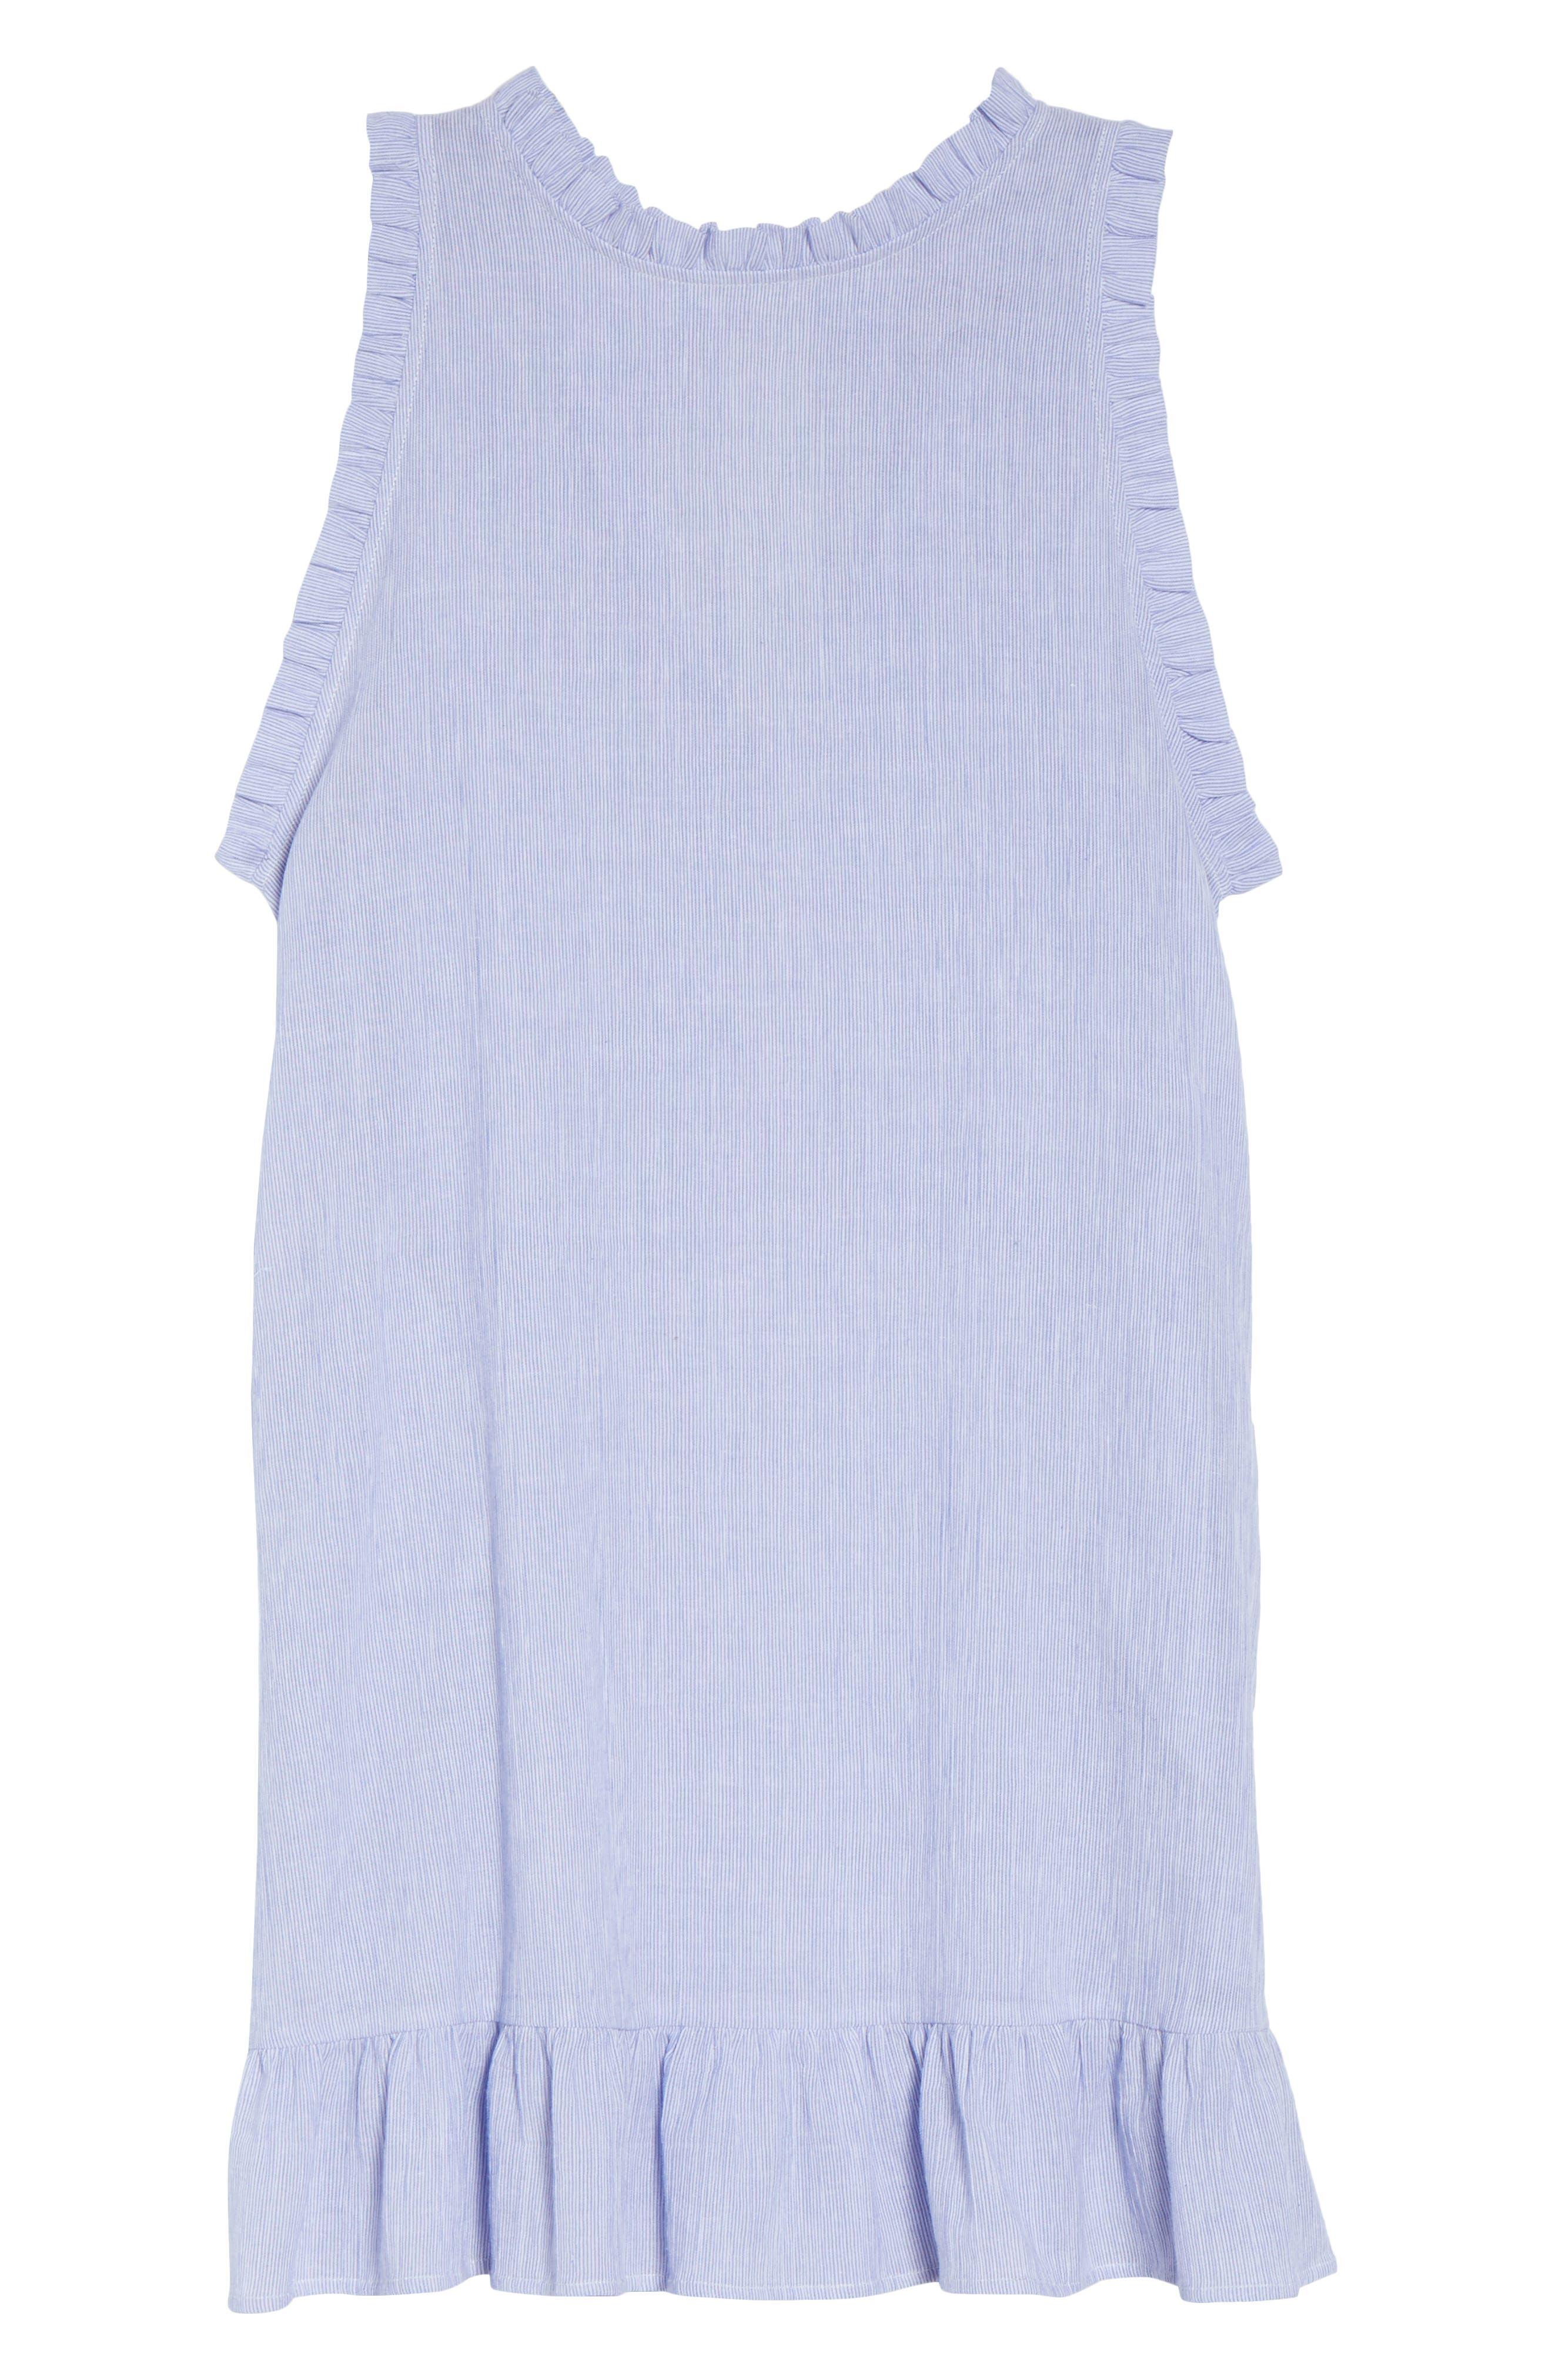 Heidi Cover-Up Dress,                             Alternate thumbnail 6, color,                             401